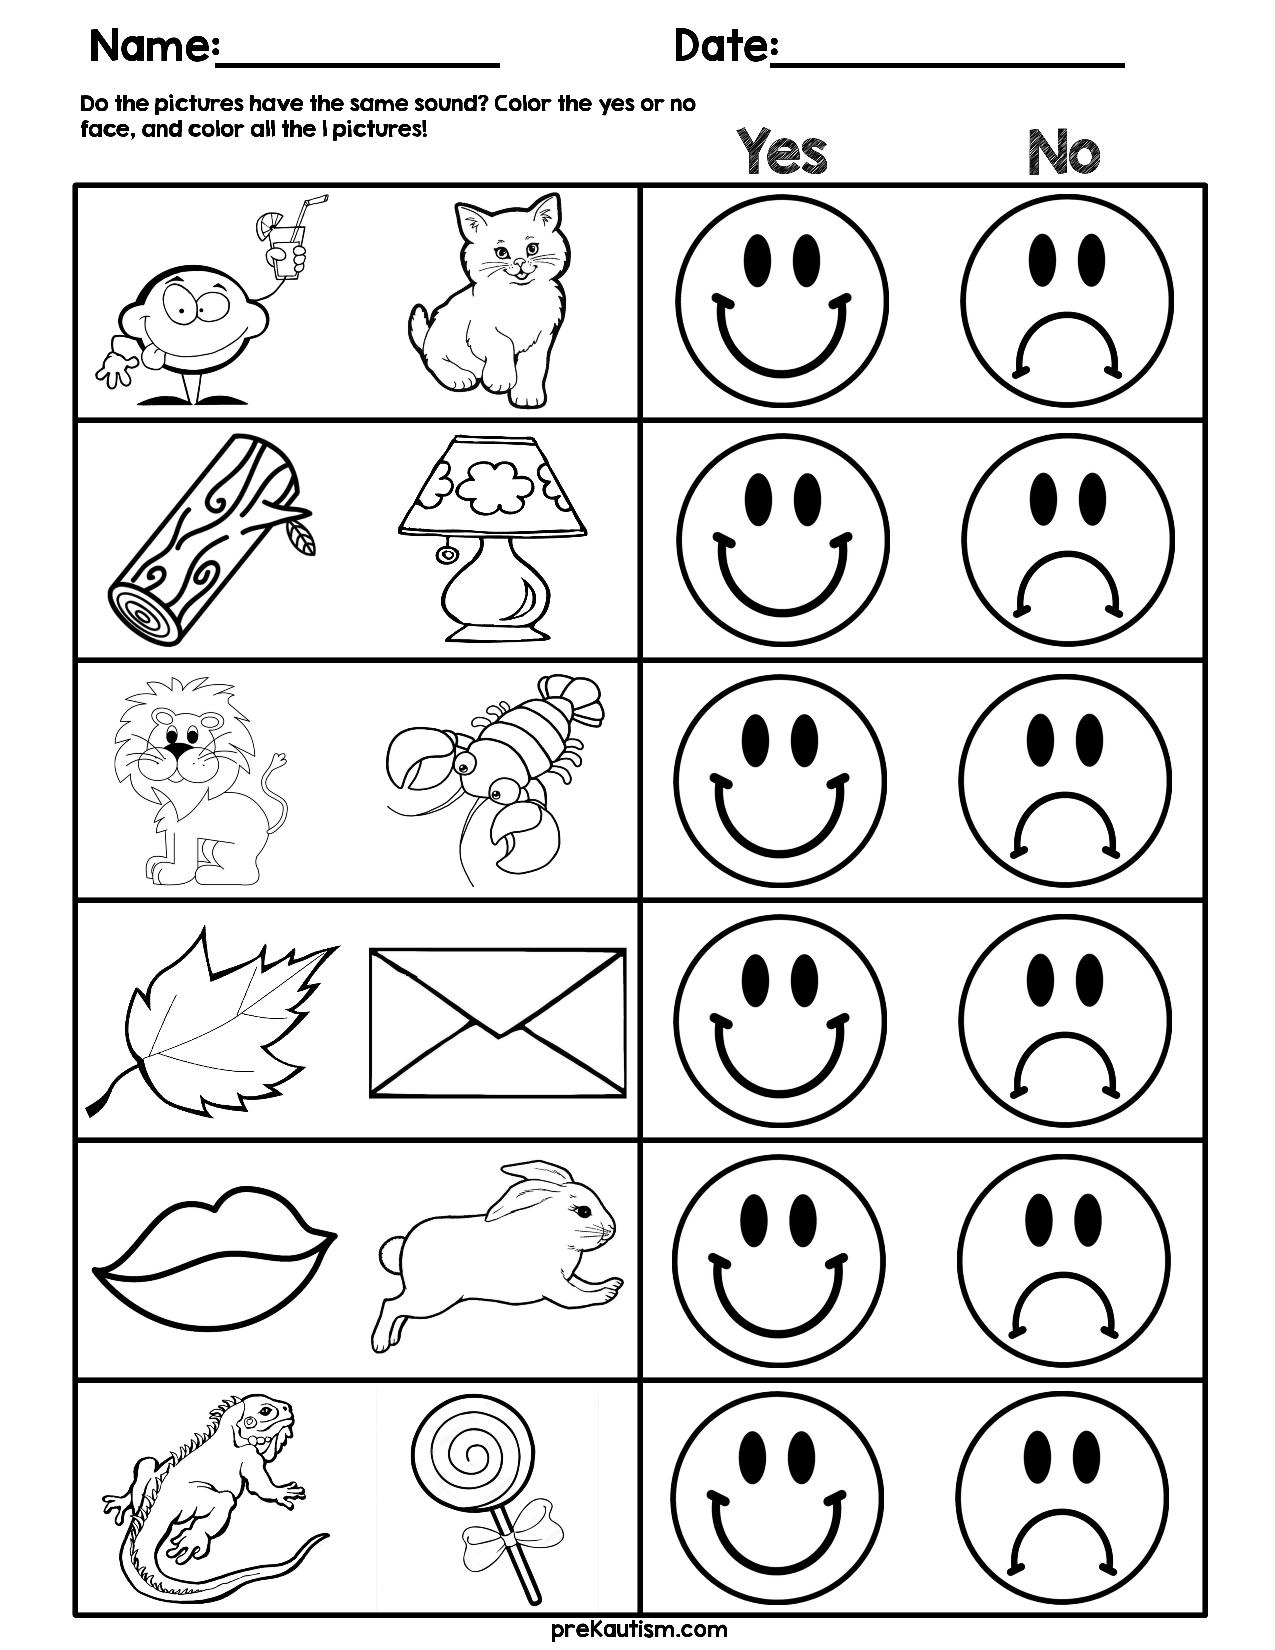 Consonant Sound Match Worksheets